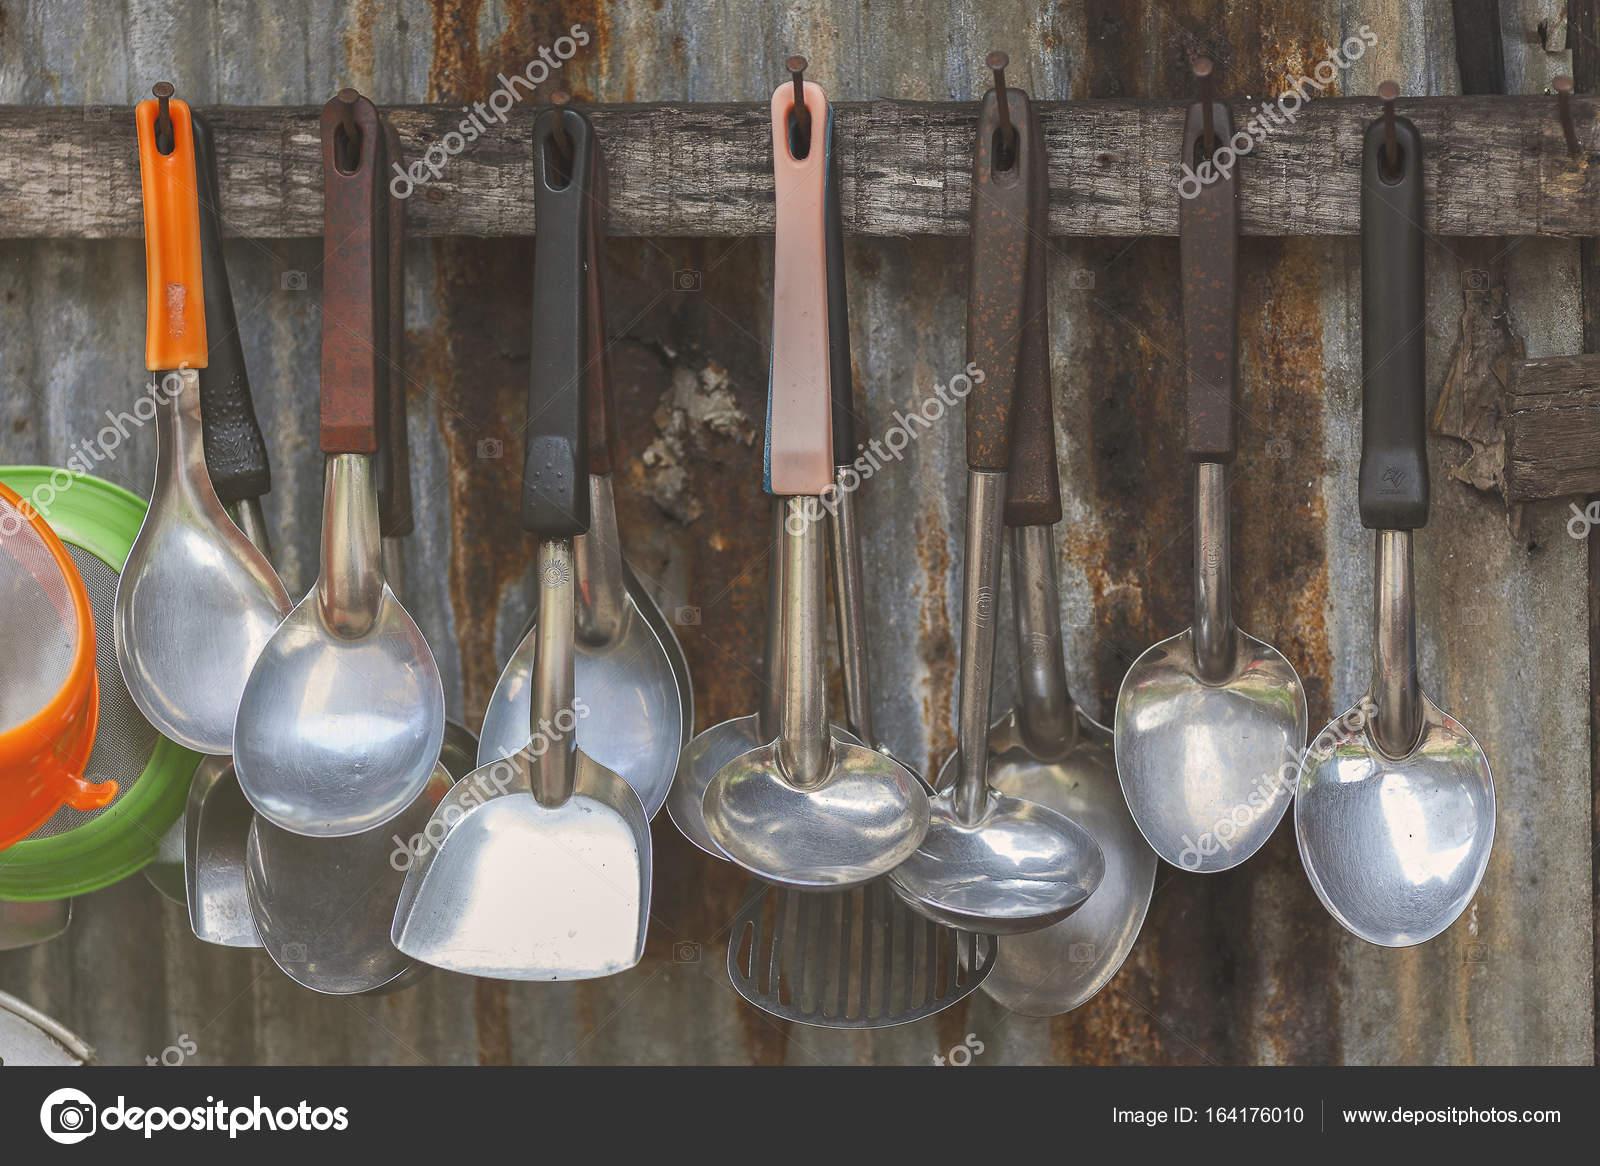 zinc kitchen table remodeling pittsburgh 厨房容器挂旁边旧锌木头背景 图库照片 c songpolpratummet yahoo com